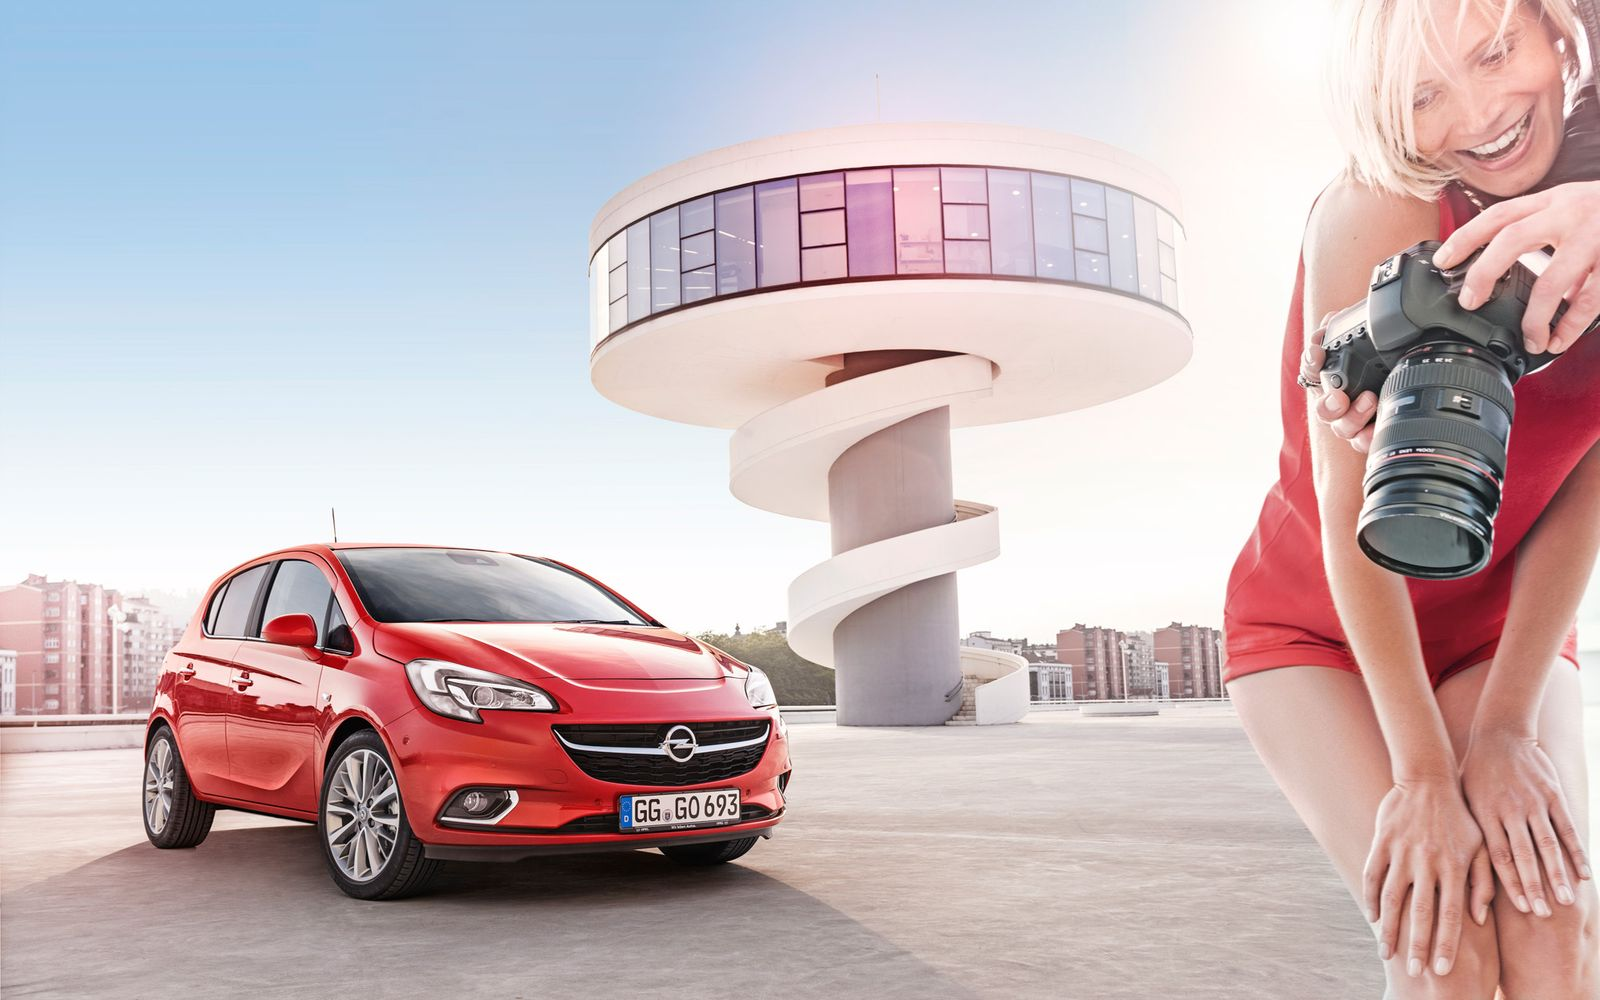 SPERRFRIST MI 09.07.14 0:01 Uhr / 2014 / Opel Corsa (Kopie)